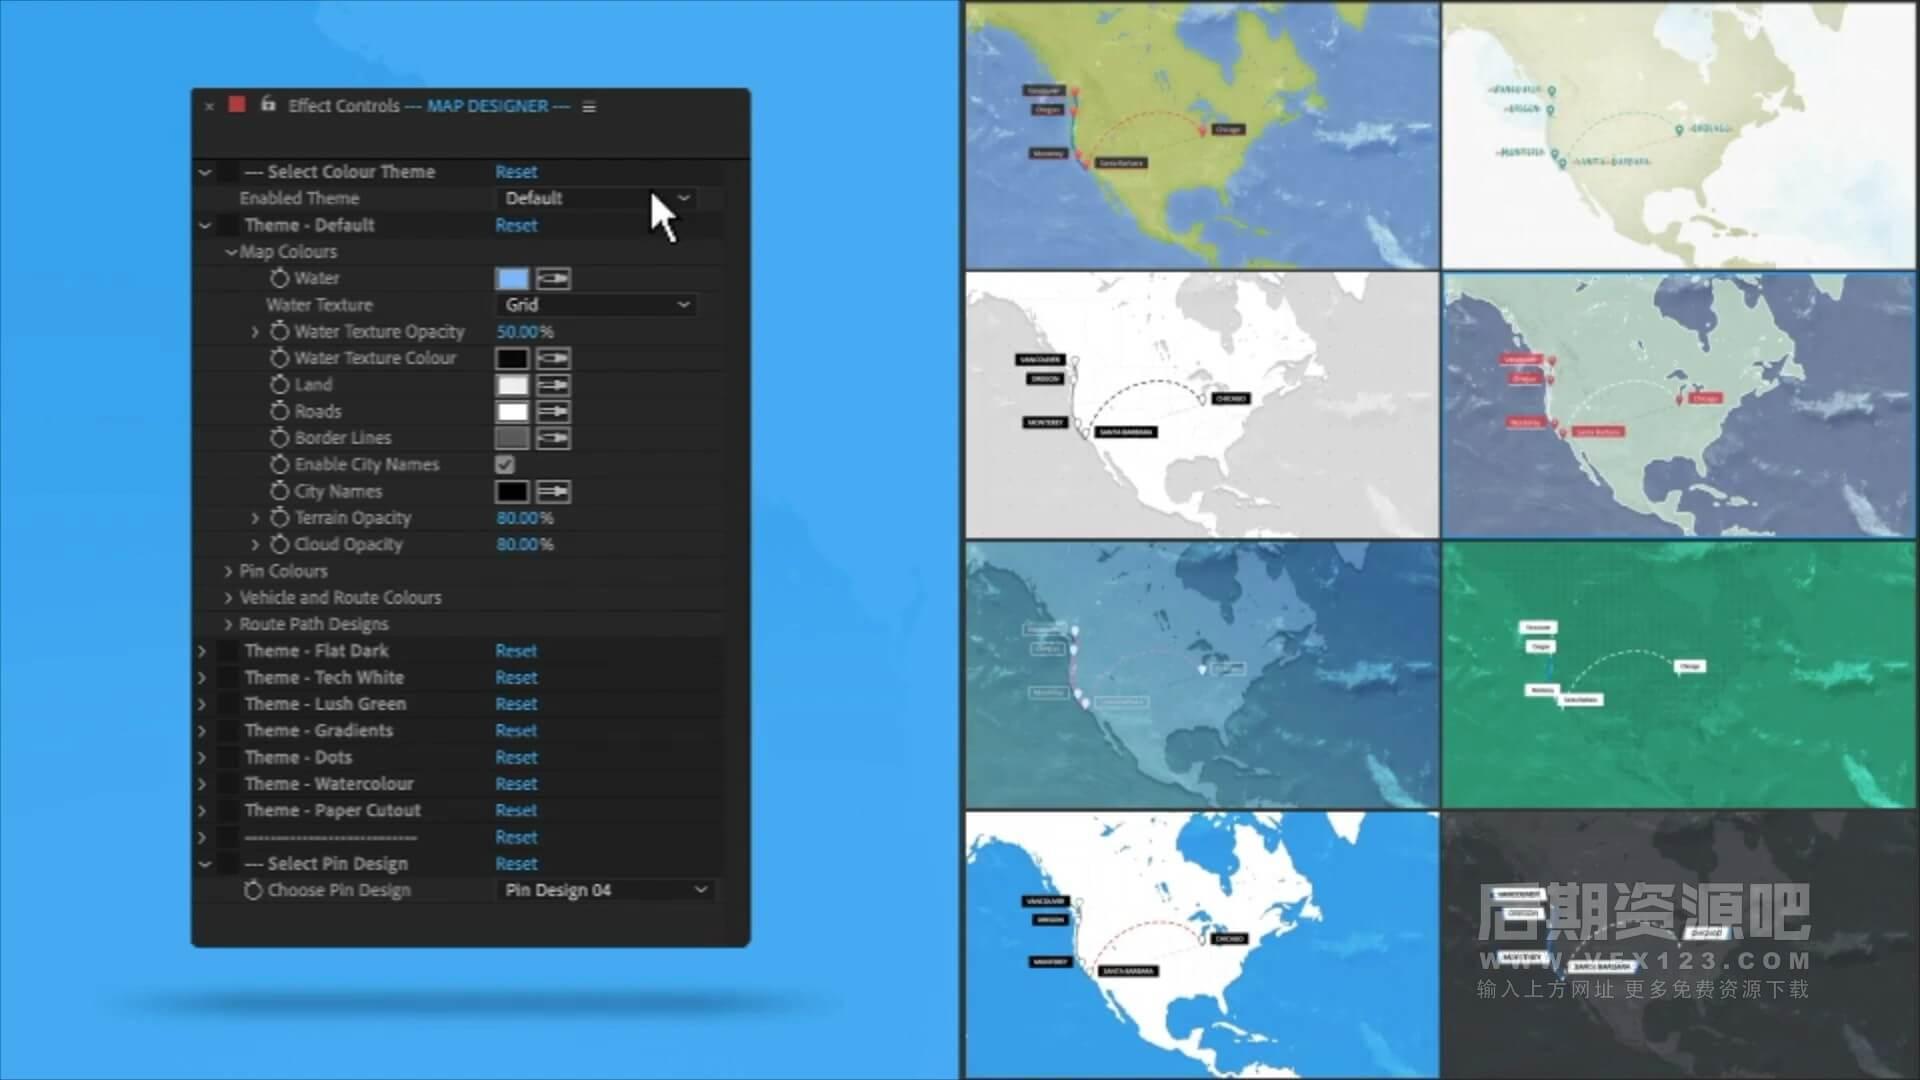 AE模板 地图路线生成工具 世界旅游地图动画制作 World Travel Maps